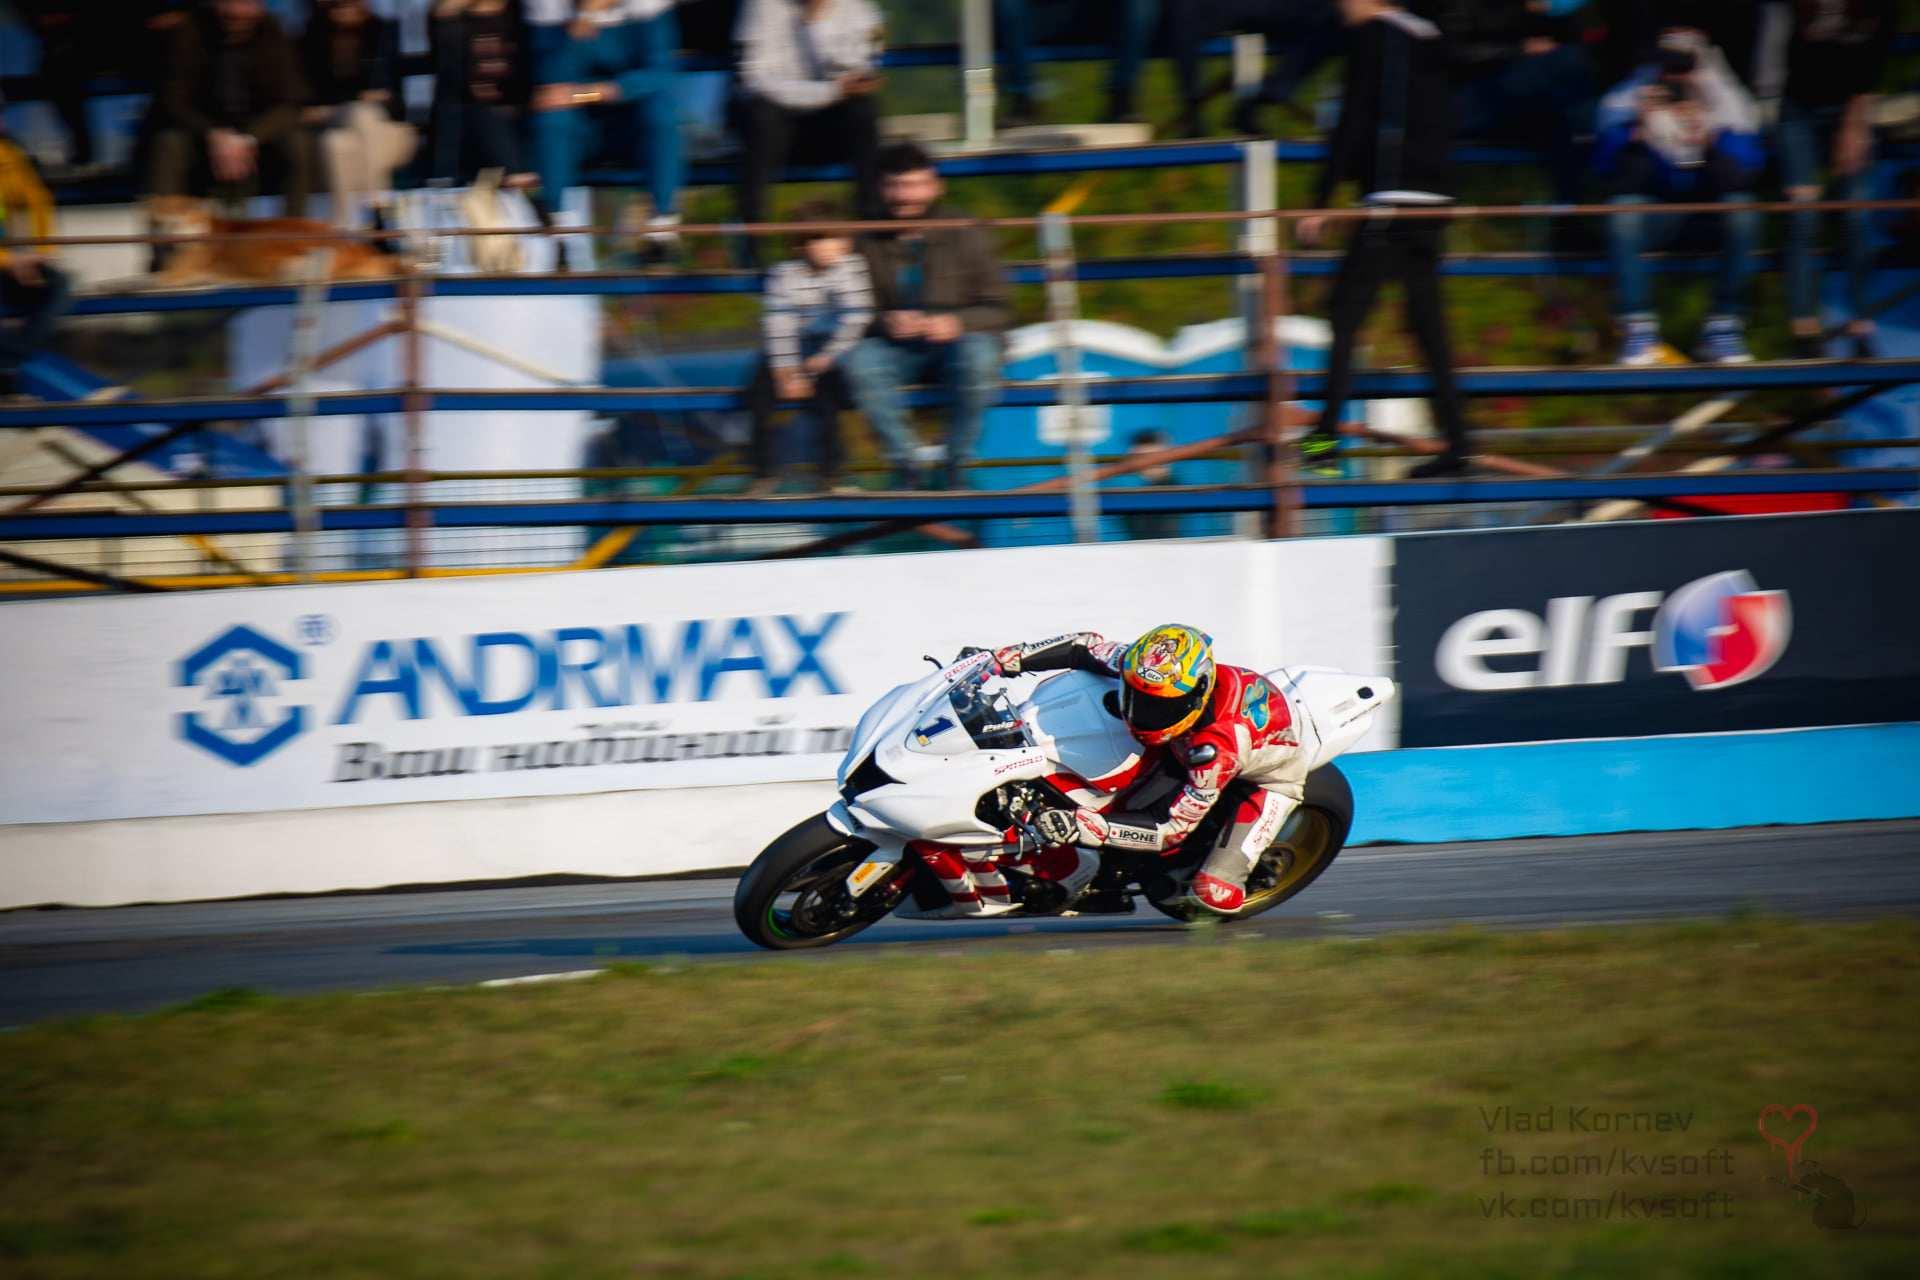 5-6_etap_MotoGPUkraine_024